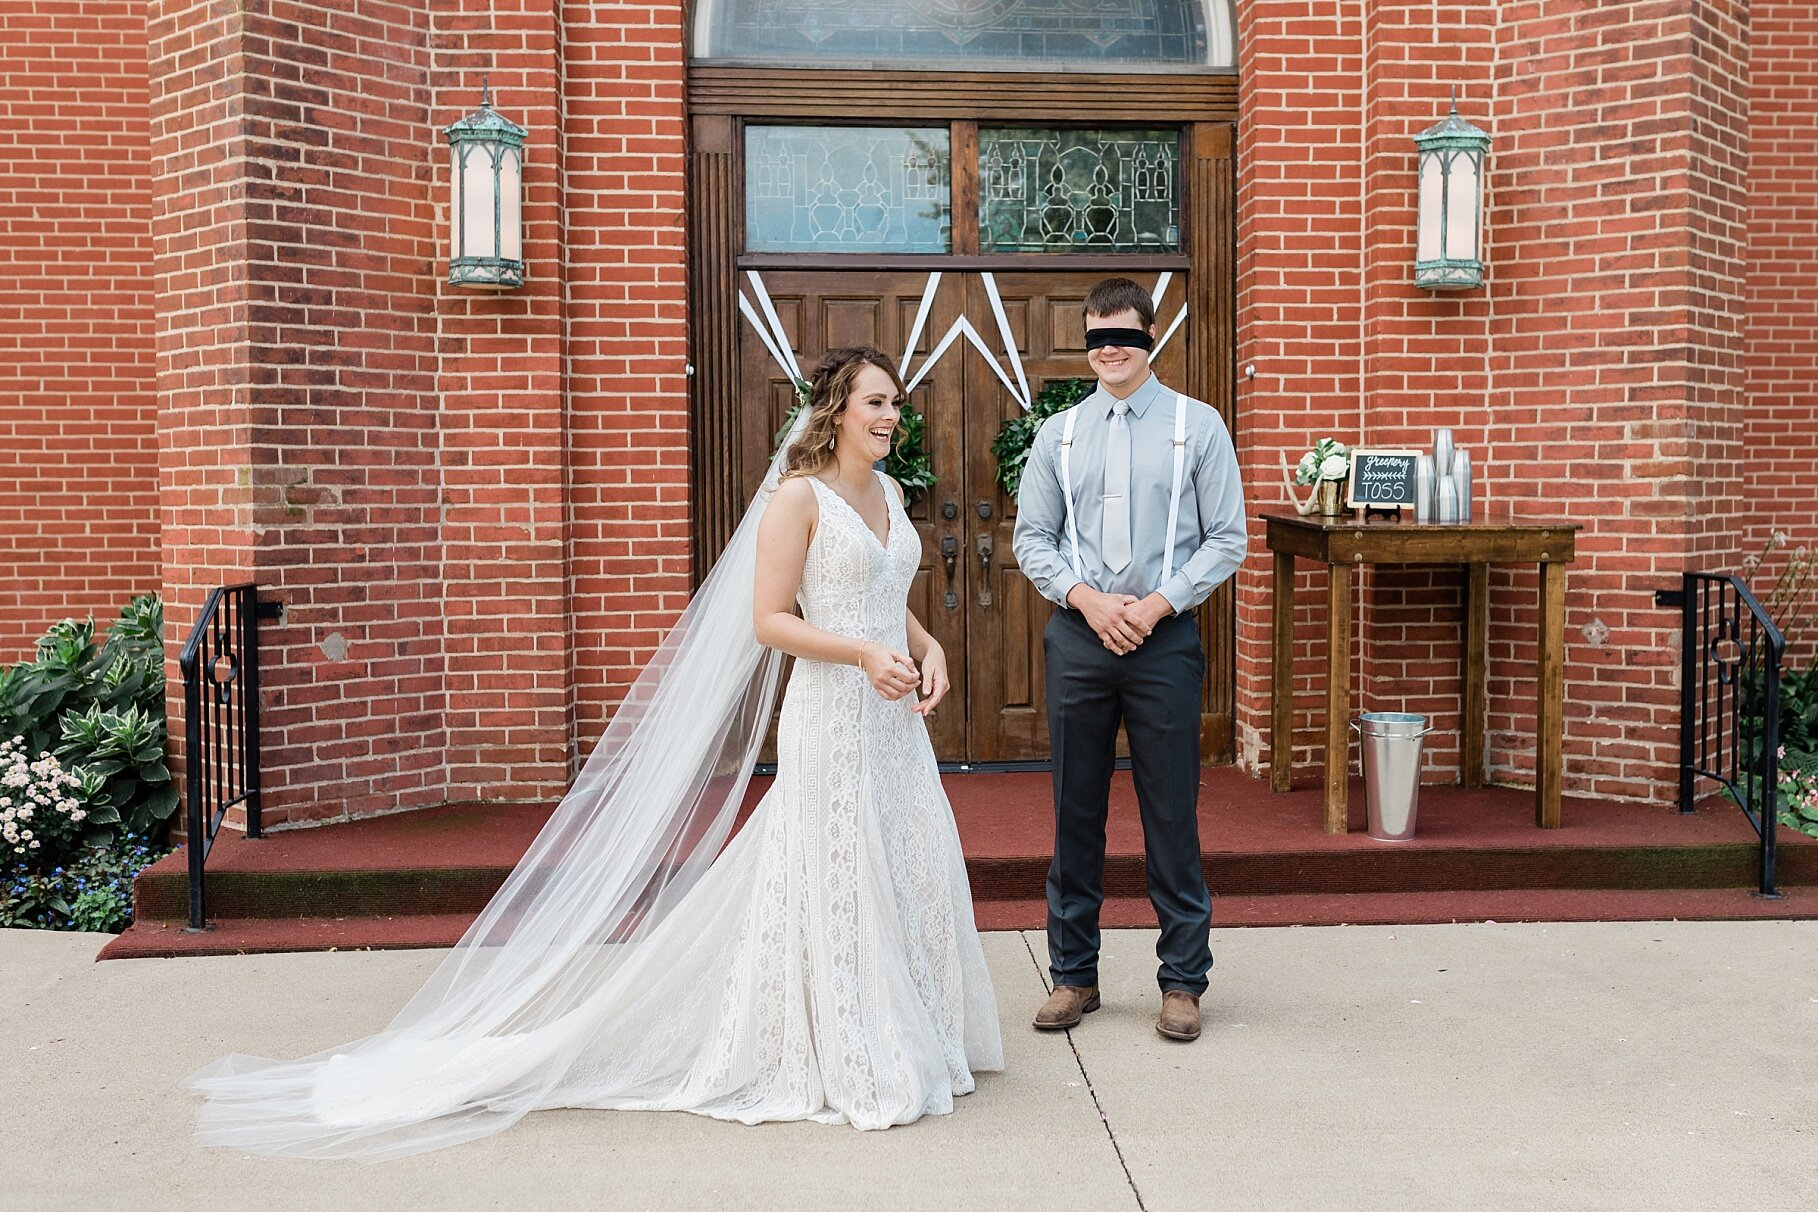 Earth-Toned Wedding by KKP Associate Wedding Photographer and Kelsi Kliethermes Photography Best Columbia Missouri Wedding Photographer_0021.jpg